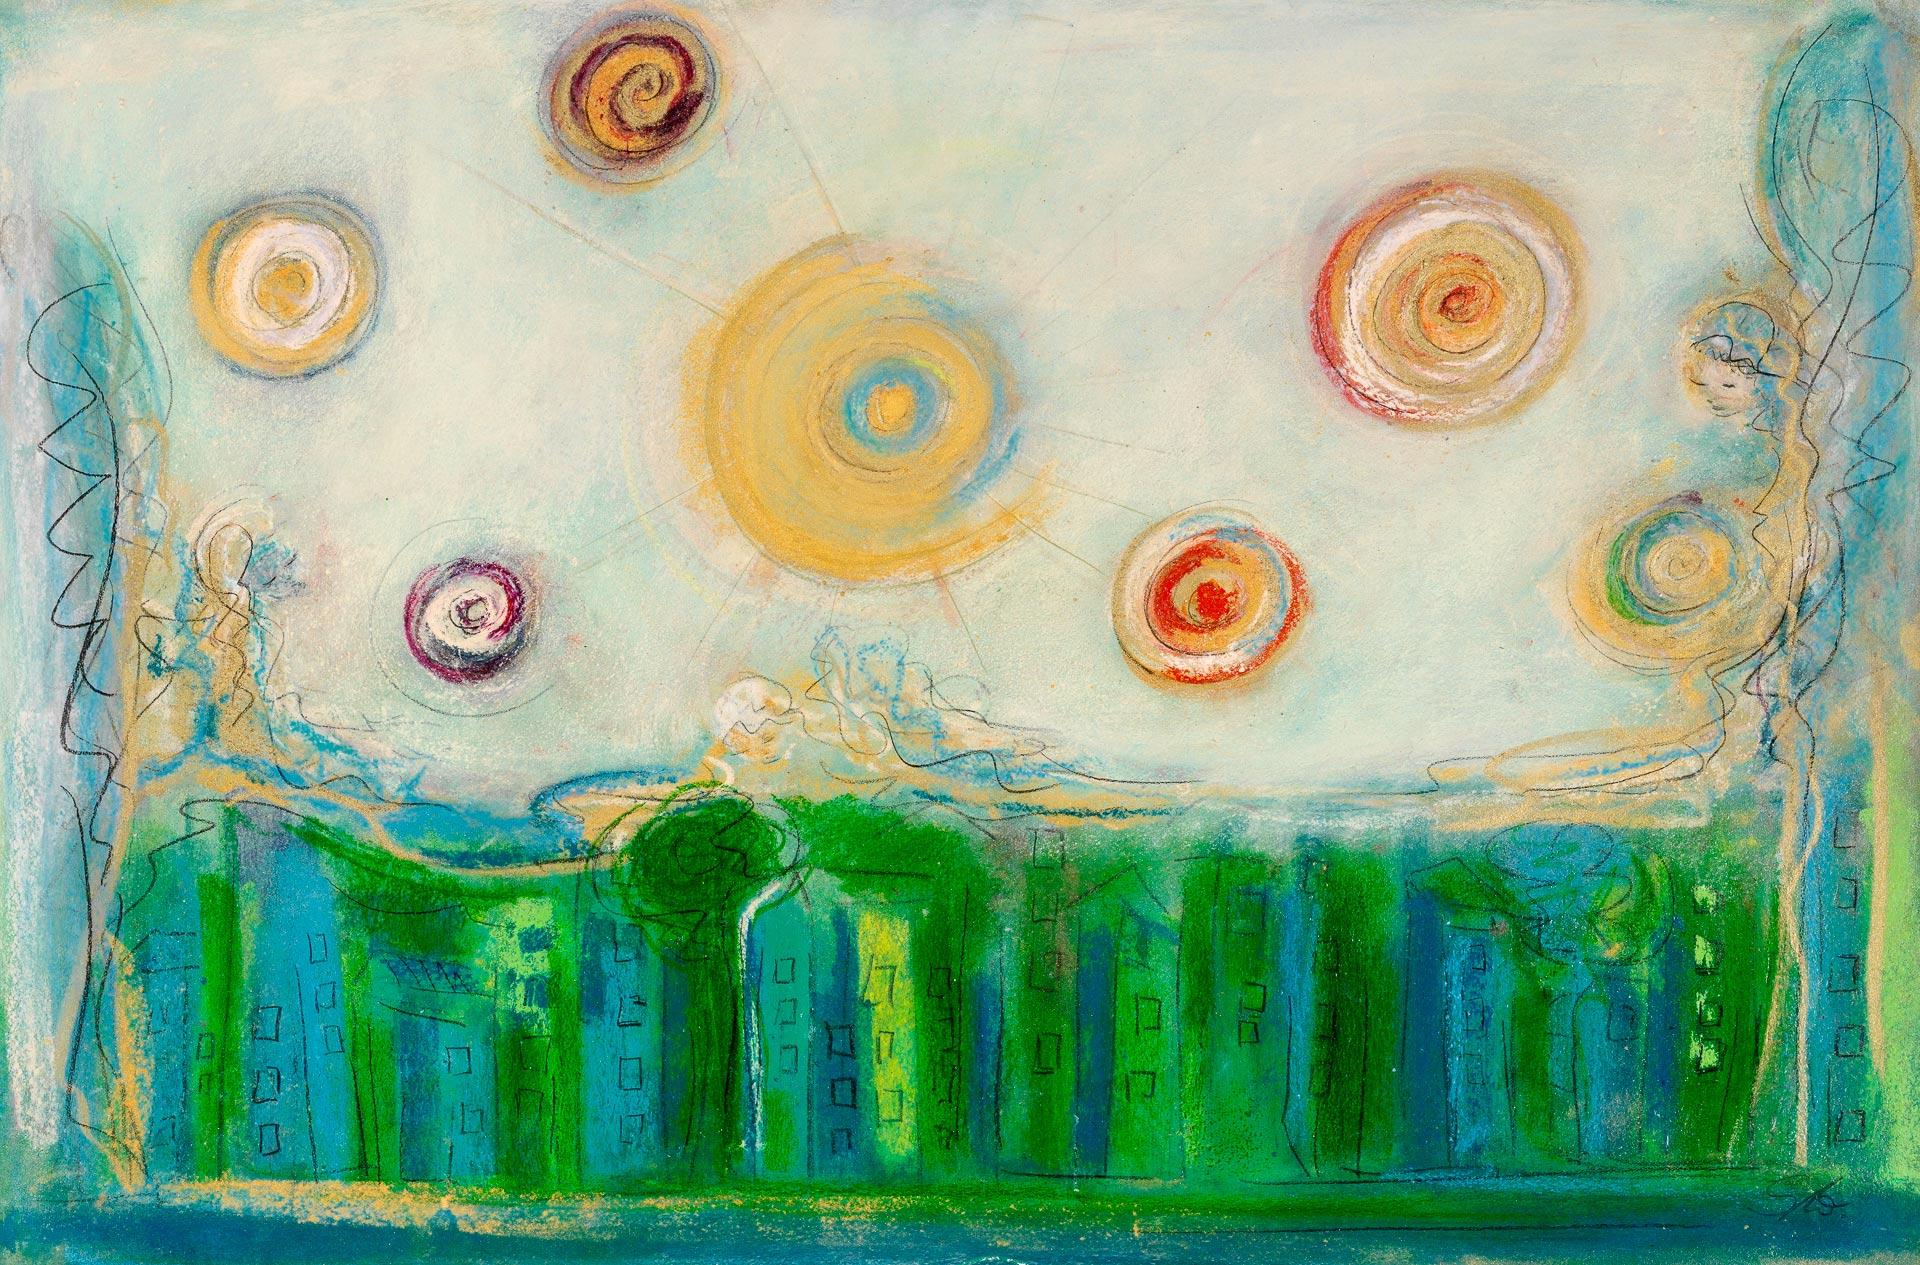 "Bild Sylvia Wolff"" Handvoll Ufer"" 2016"